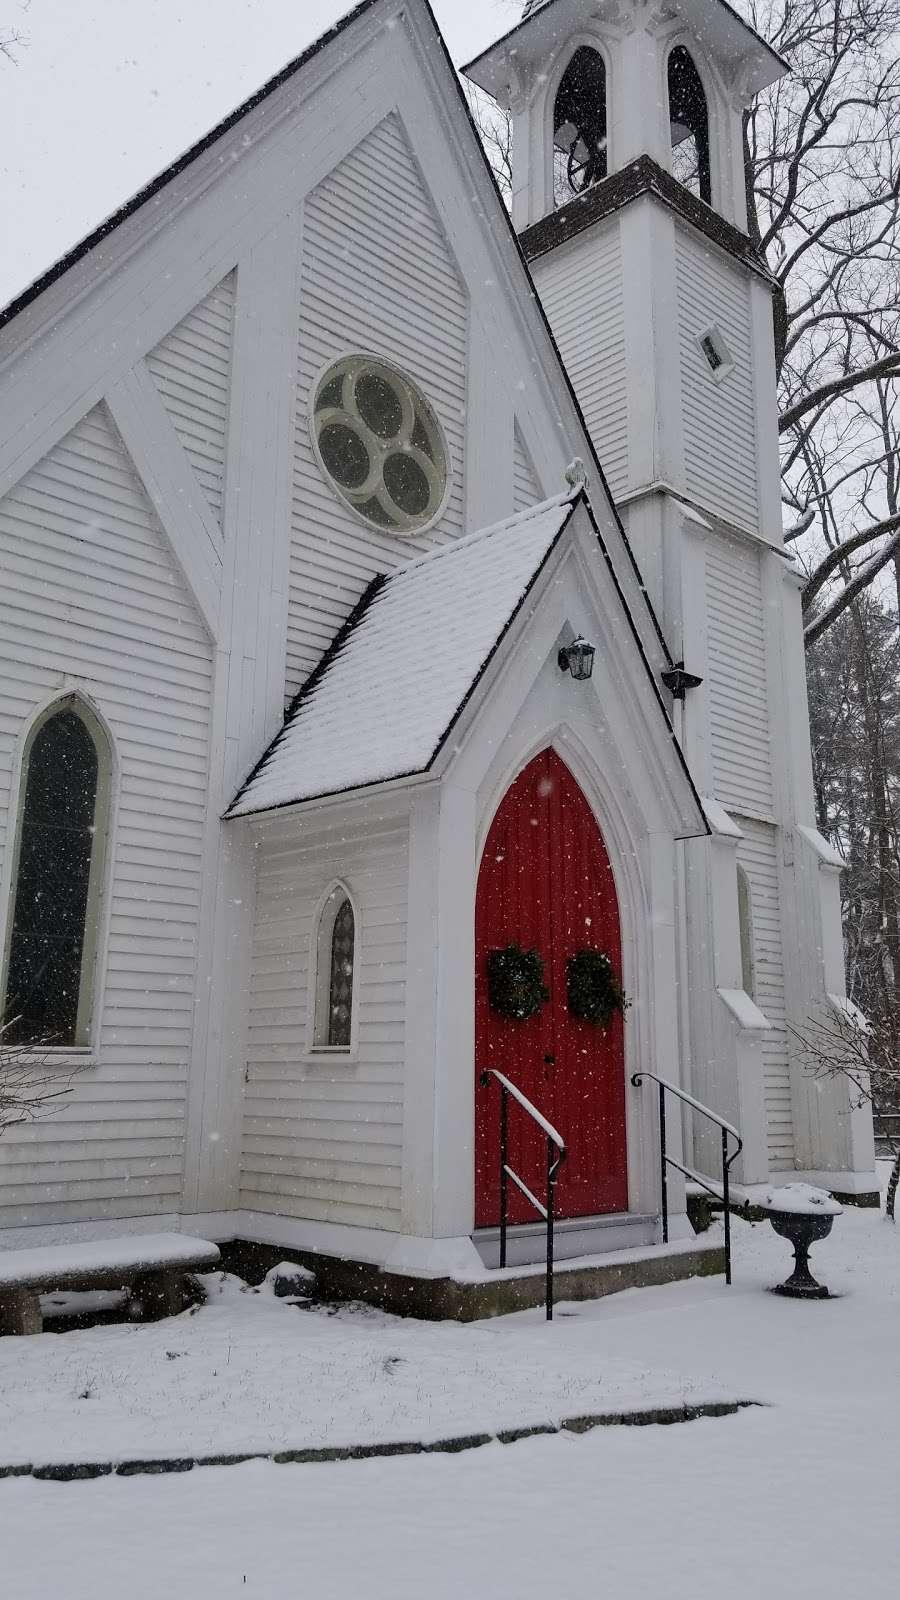 St James Episcopal Church - church  | Photo 1 of 2 | Address: 296 Titicus Rd, North Salem, NY 10560, USA | Phone: (914) 669-5563